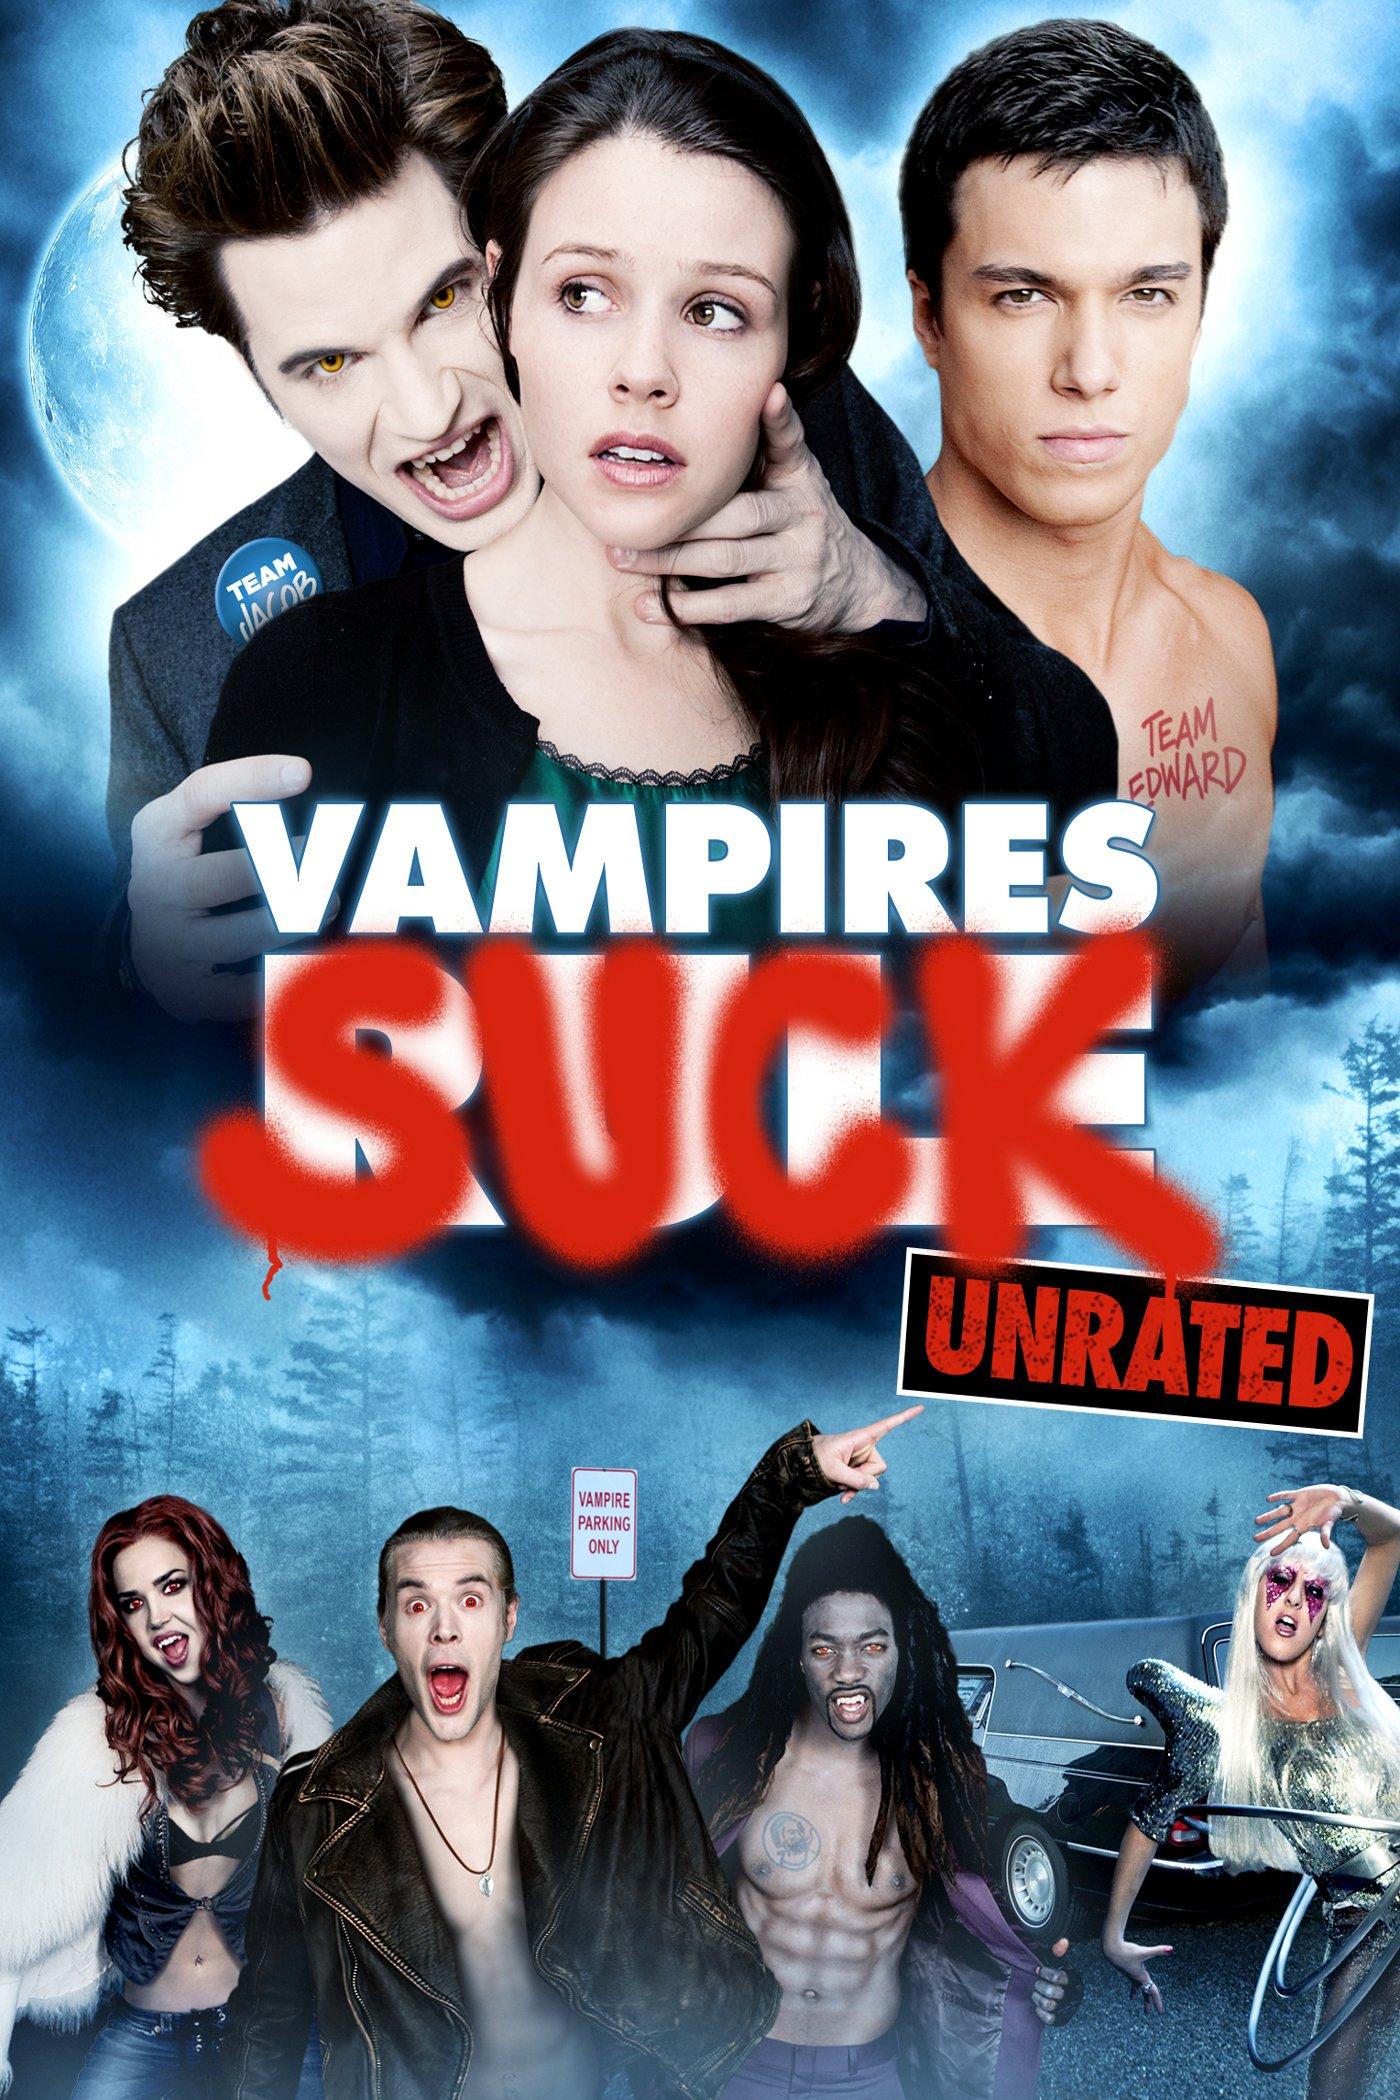 vampire-saugen-filmauflistung-heisses-facking